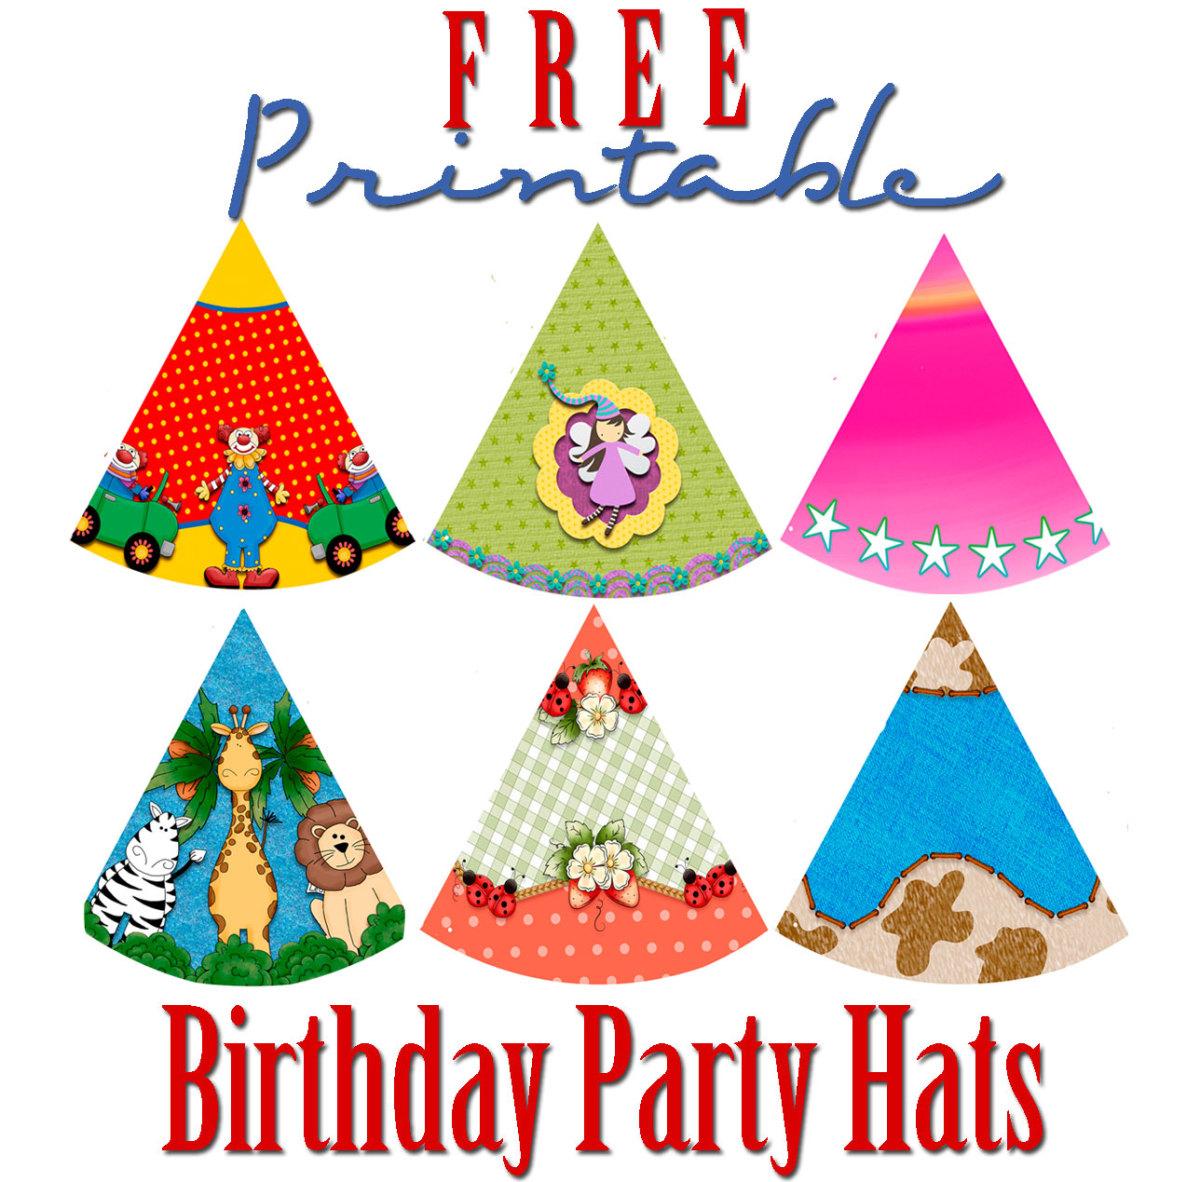 Free Printable Birthday Party Hats